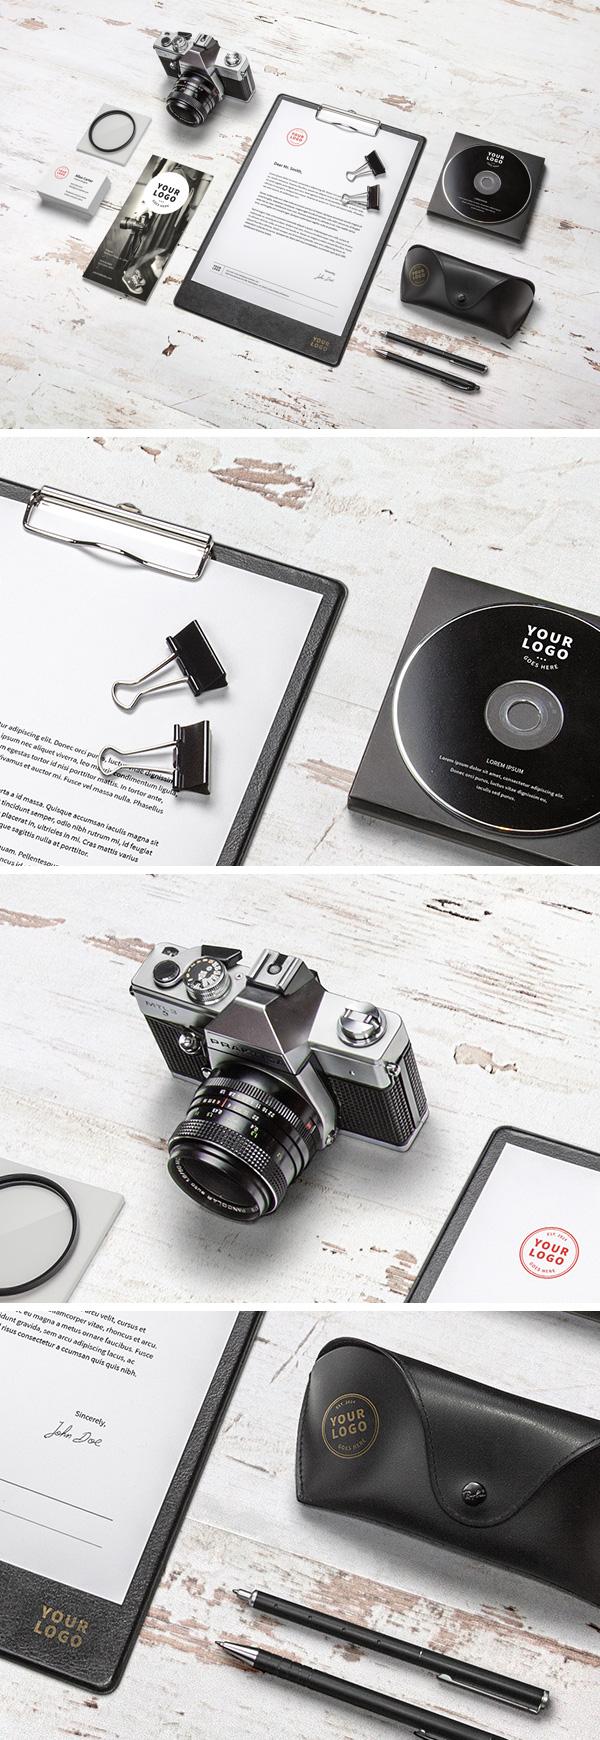 Branding-Identity-MockUp-Vol10-600